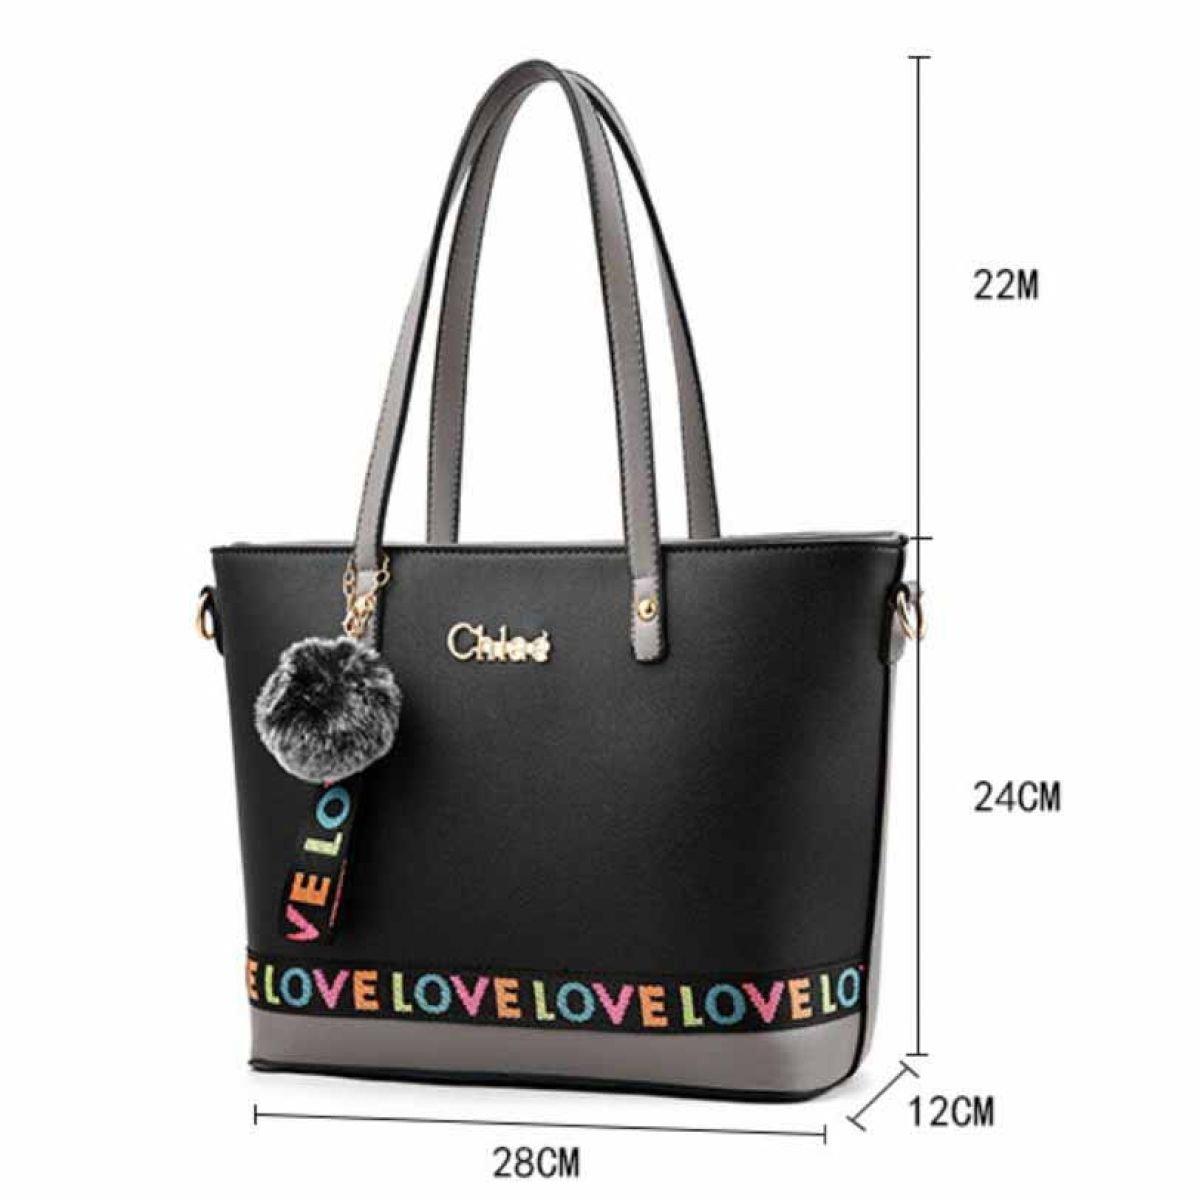 HAOXIAOZI Tragbare Damen Umhängetasche Umhängetasche Umhängetasche Schöne Mode Handtaschen,Gold B077ZV379D Henkeltaschen Bevorzugtes Material 626e2c